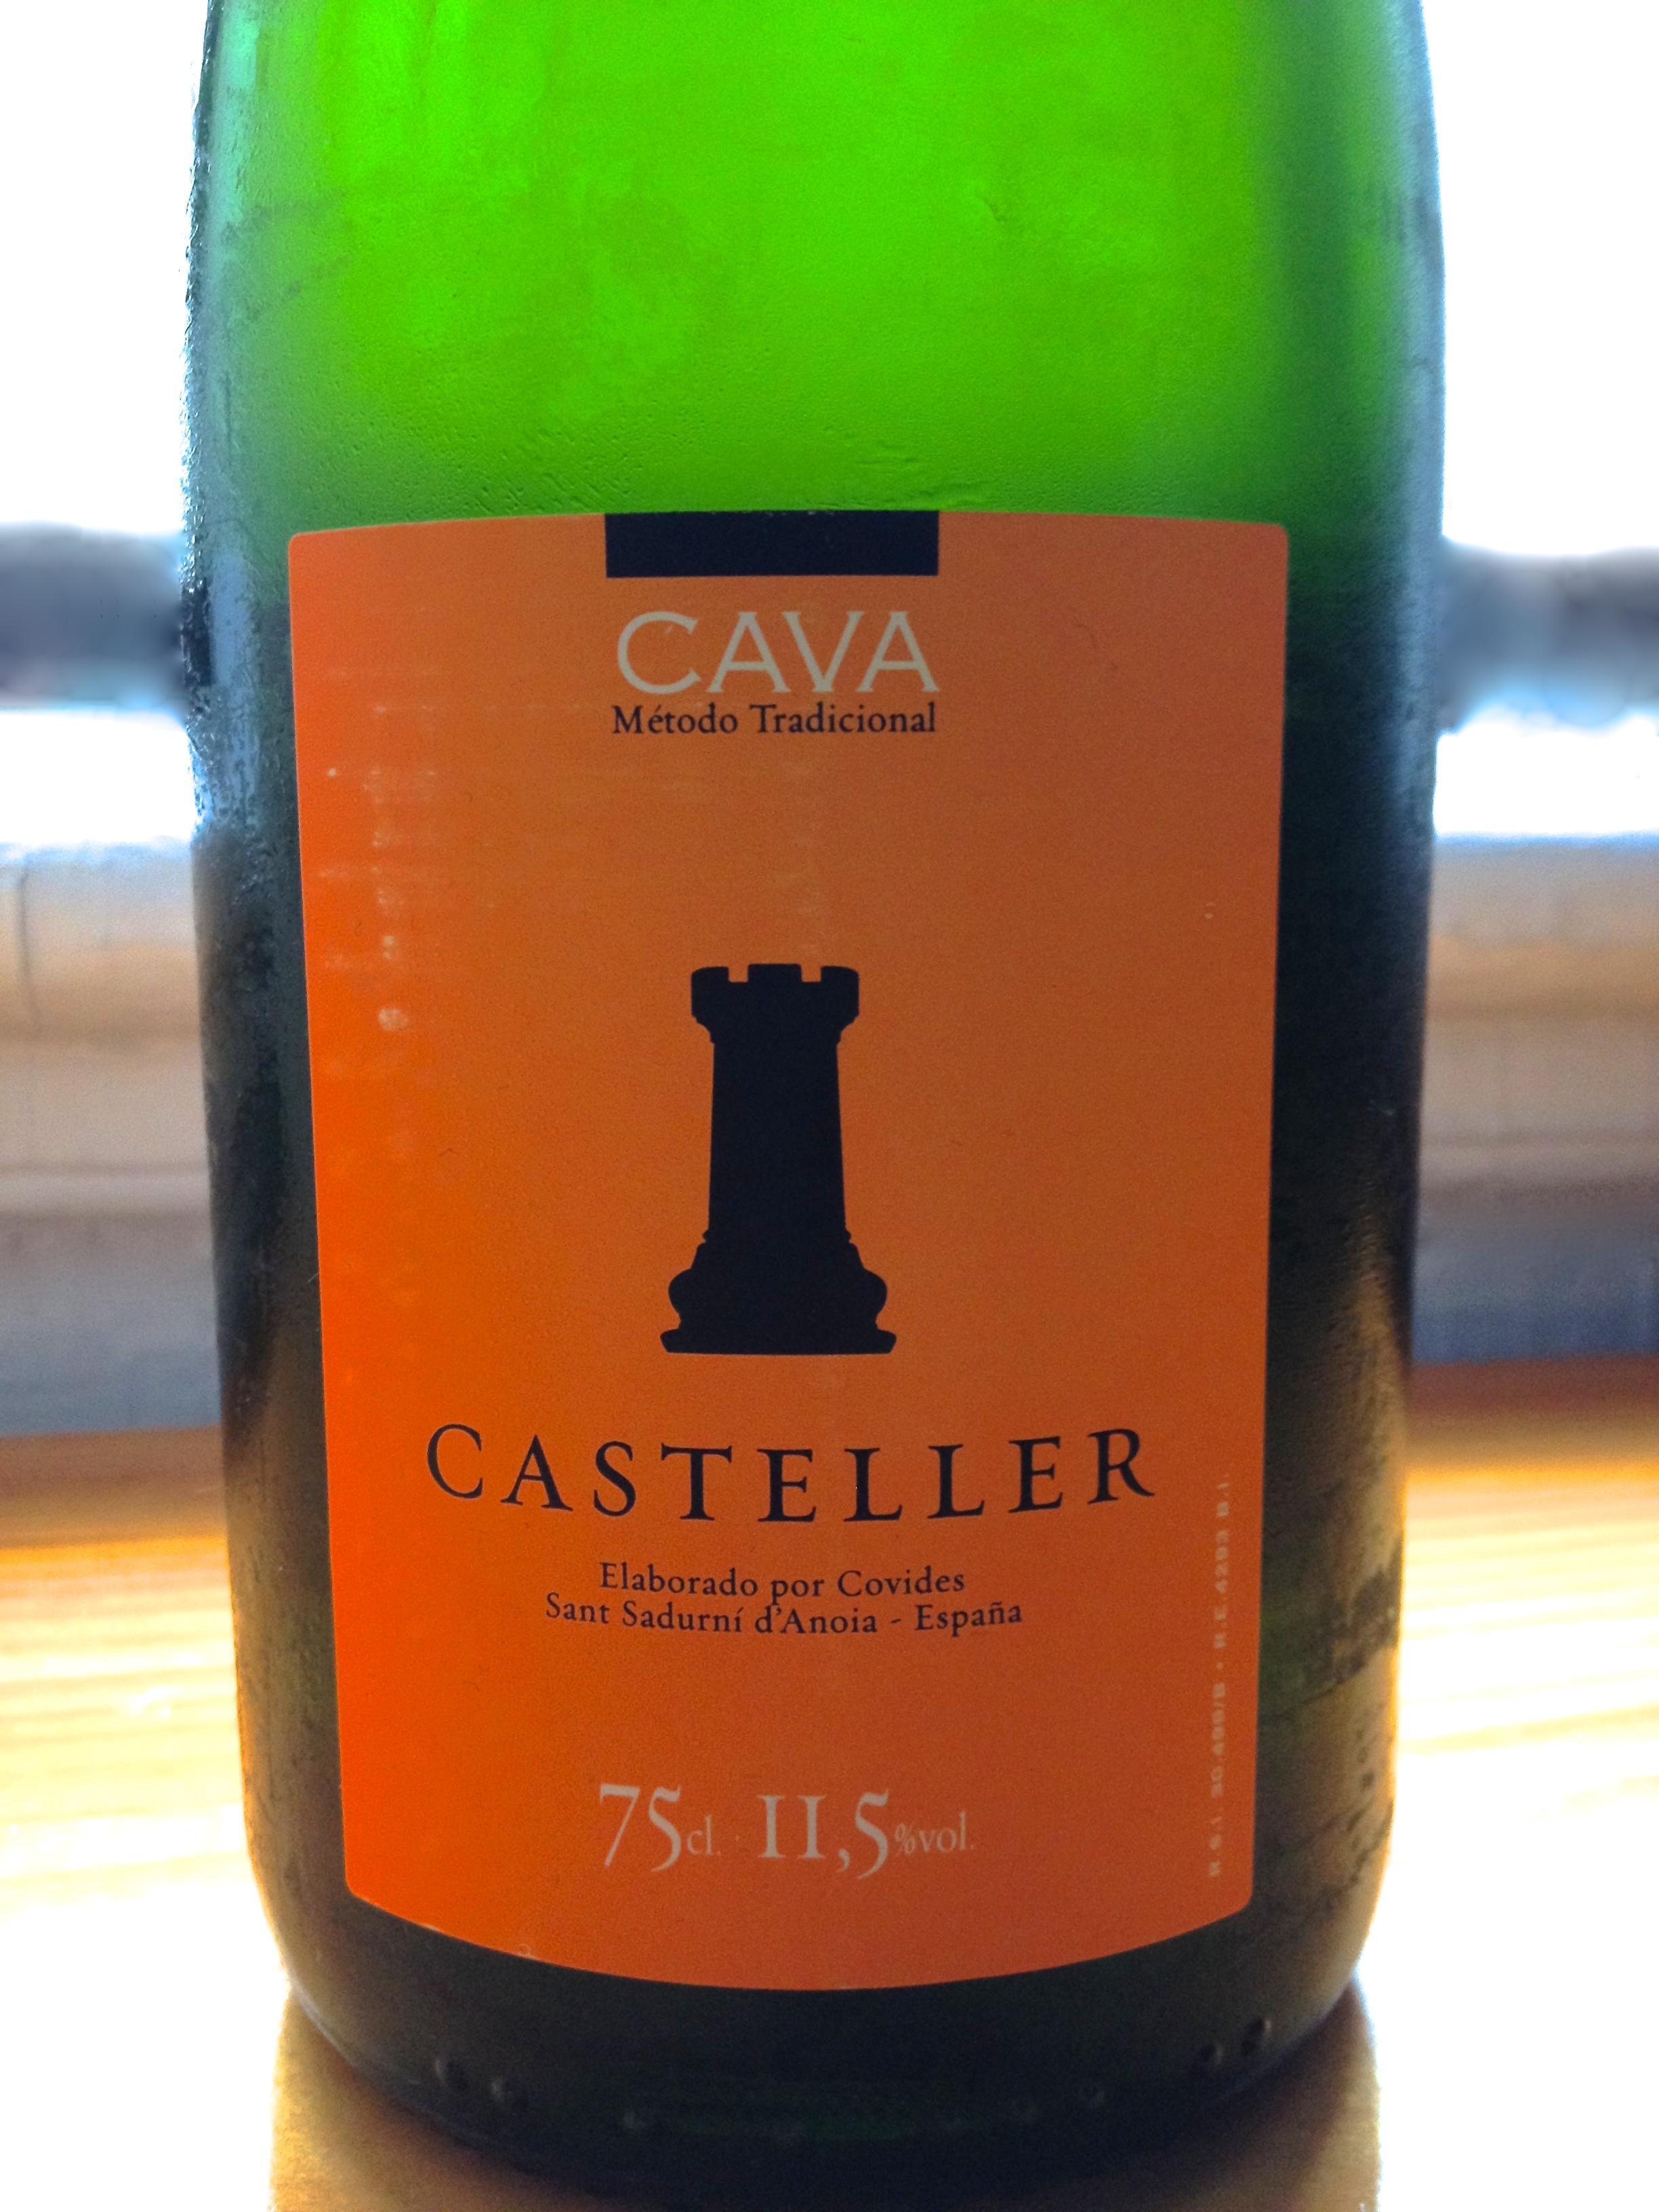 Casteller Brut Cava 2